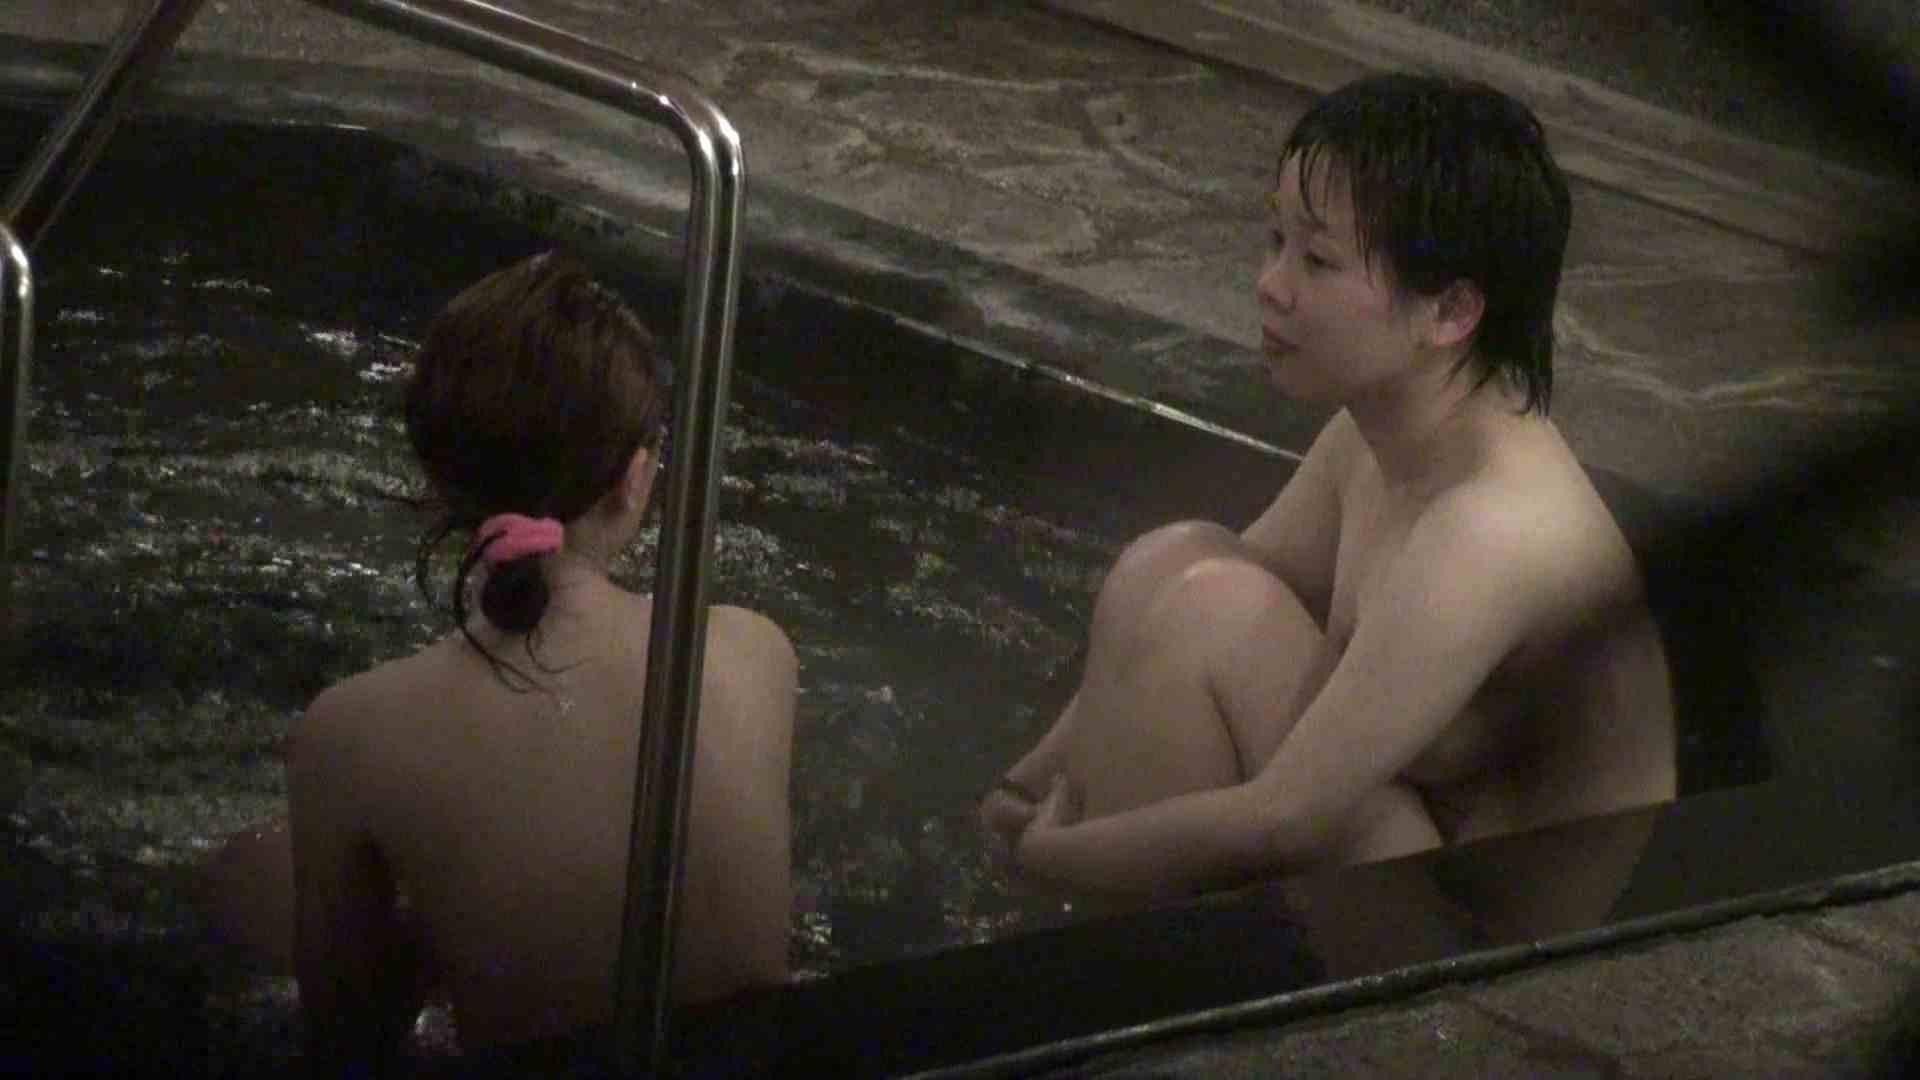 Aquaな露天風呂Vol.394 盗撮 | OLセックス  99画像 10